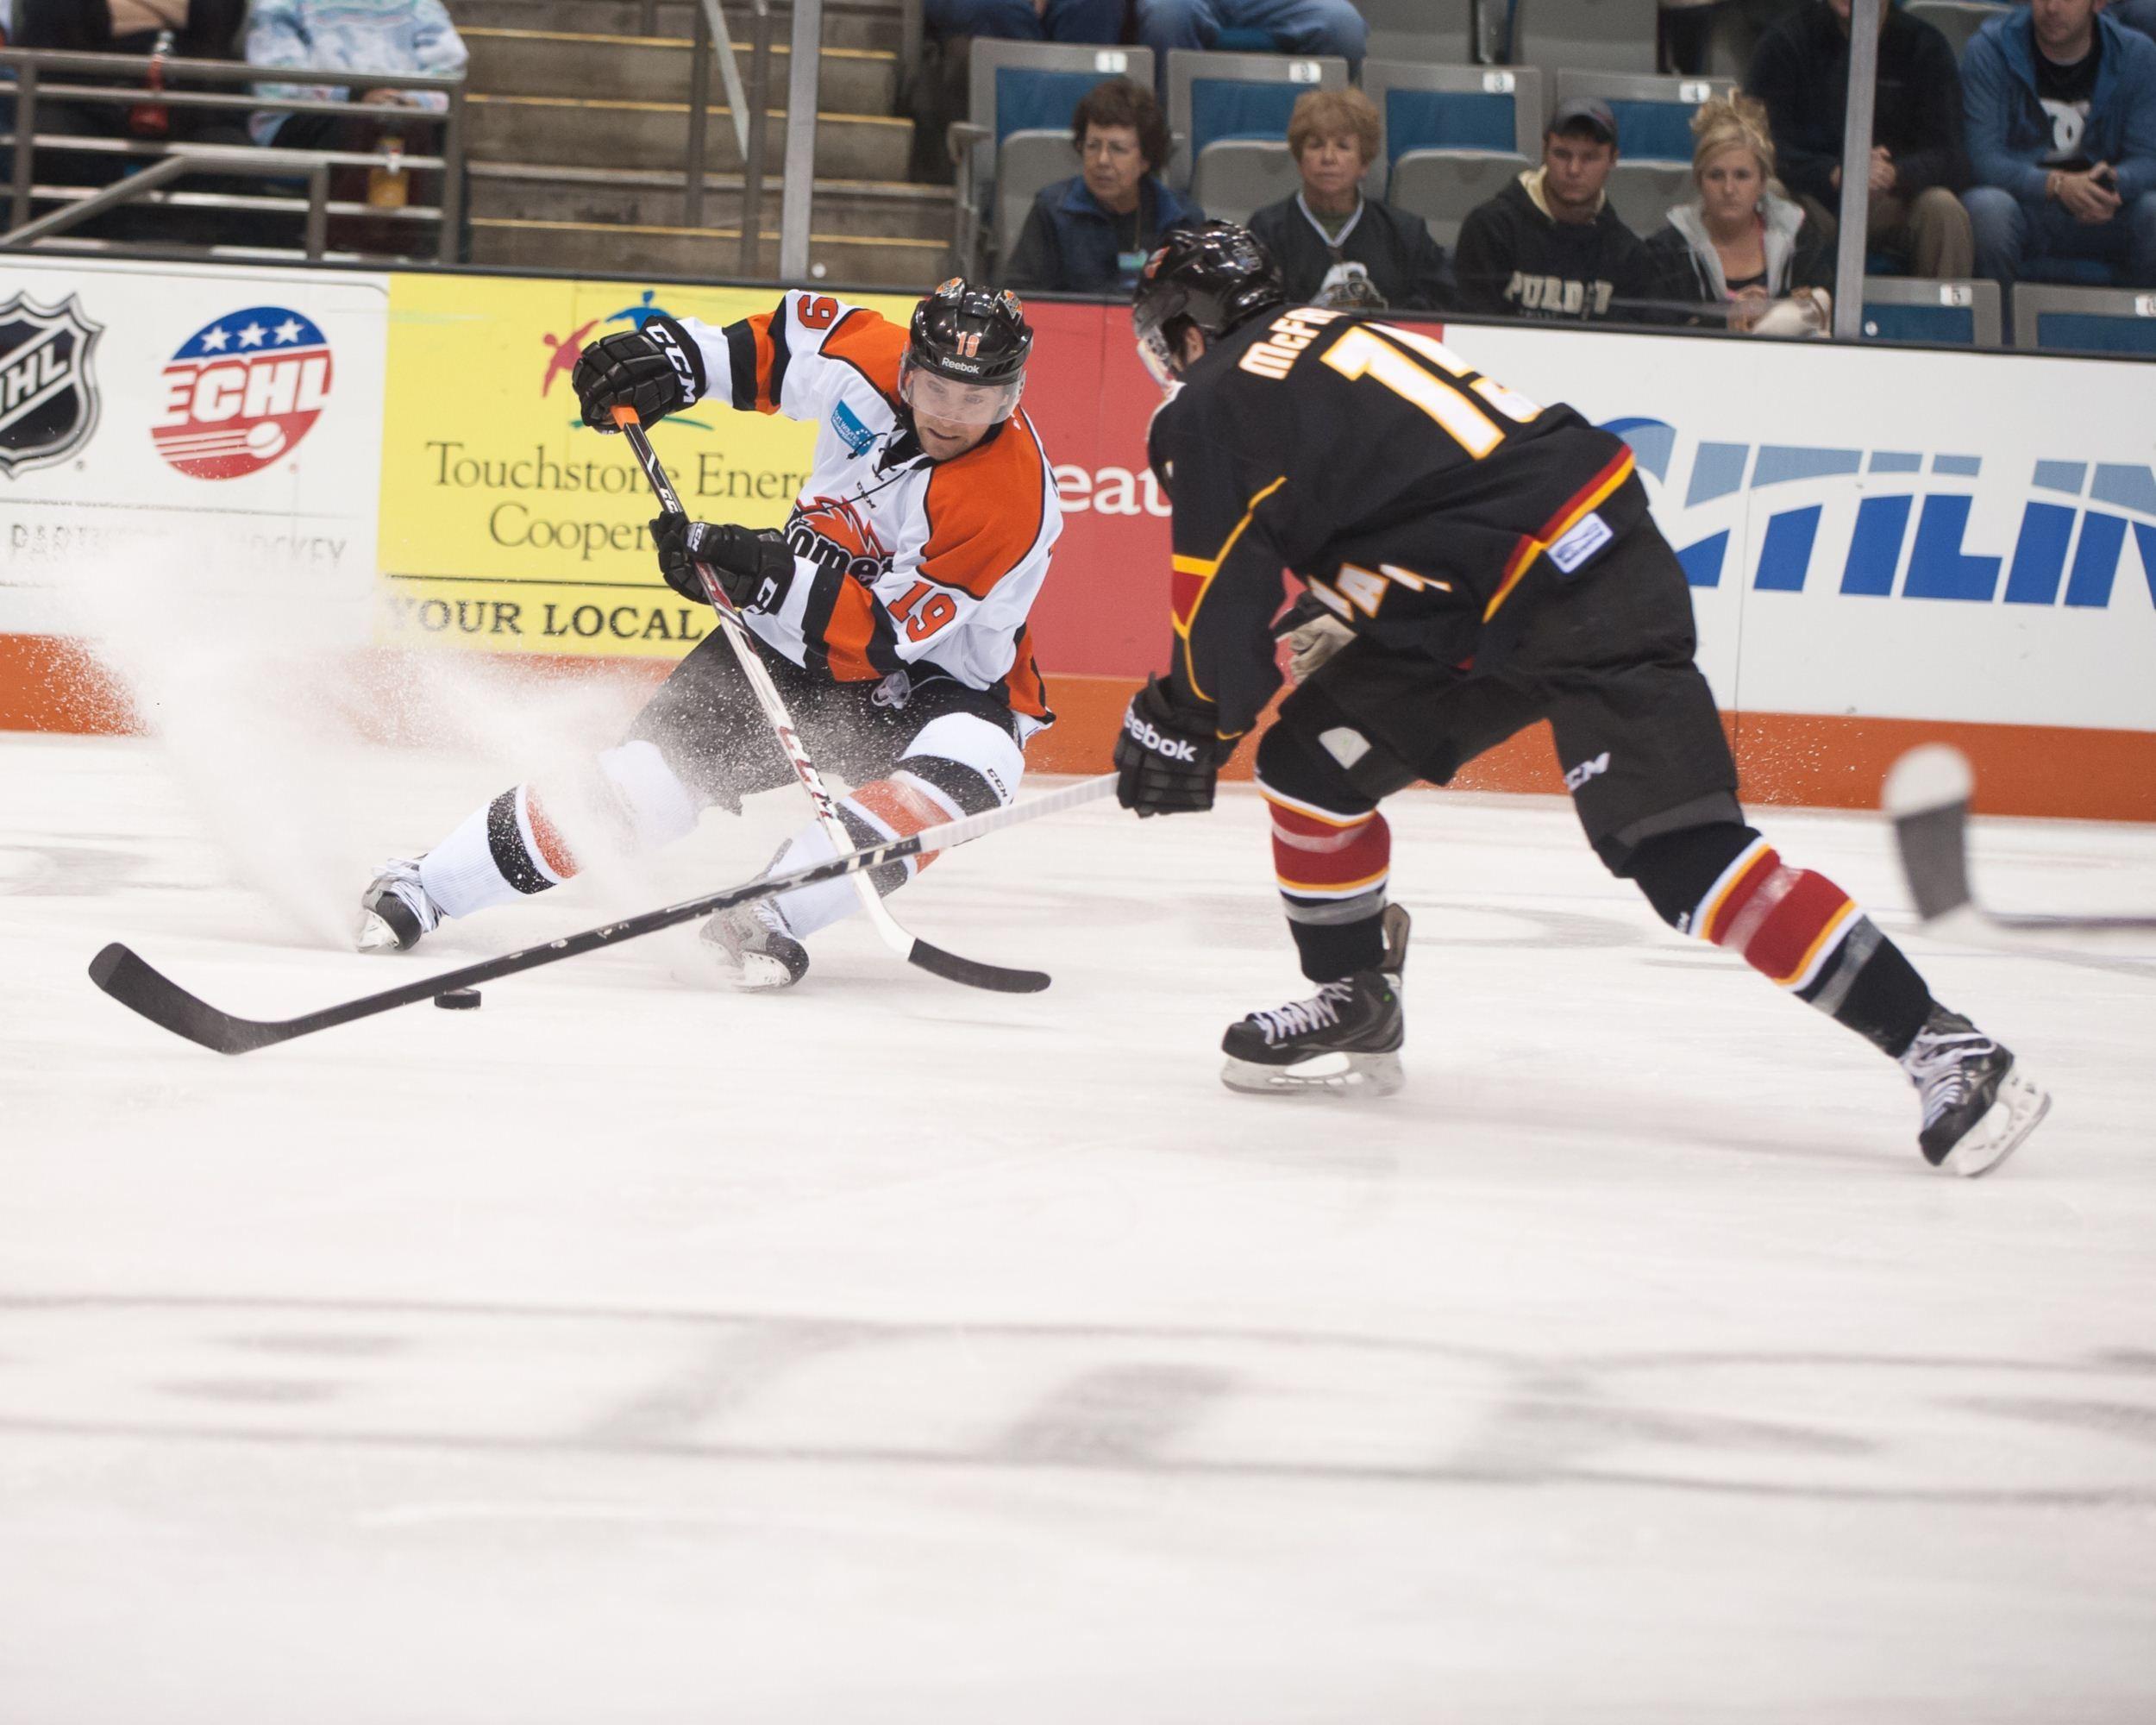 Fort Wayne Komet Hockey Saturday October 26th Vs Cyclones Sports Fort Wayne Hockey